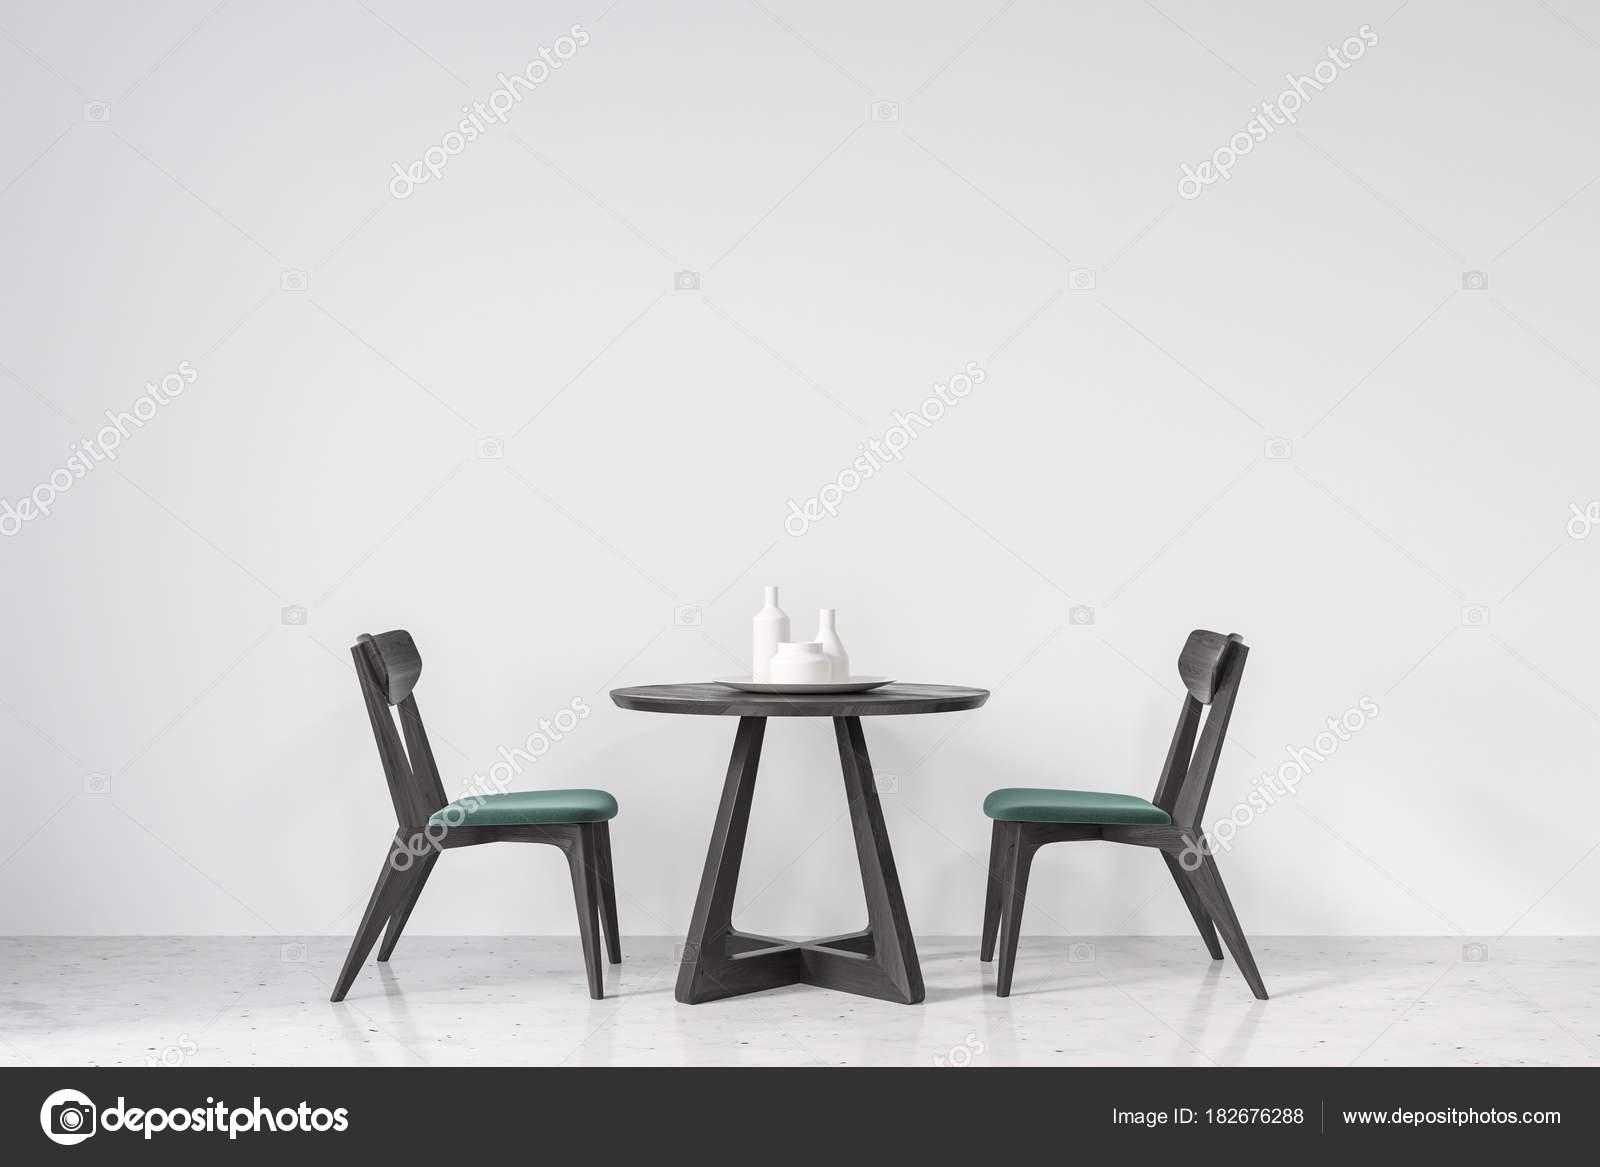 Zwarte Ronde Tafel : Ronde tafel en groene en zwarte stoelen u stockfoto